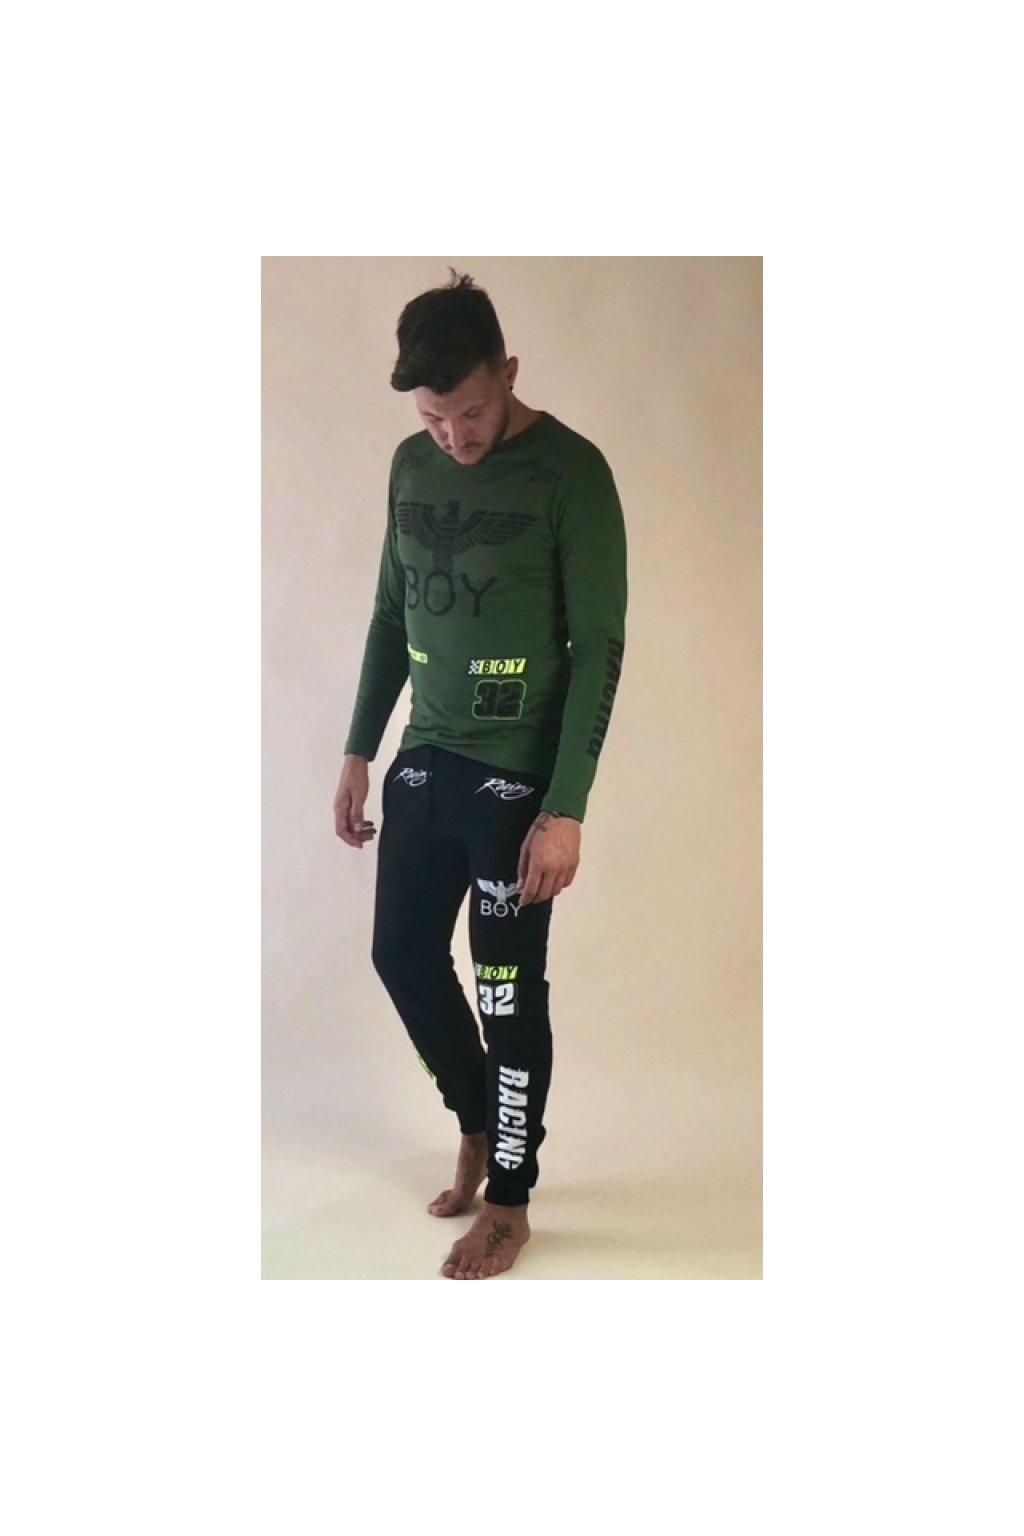 Tričko Boy London s dlouhým rukávem - RACE khaki (Velikost Velikost XXL)